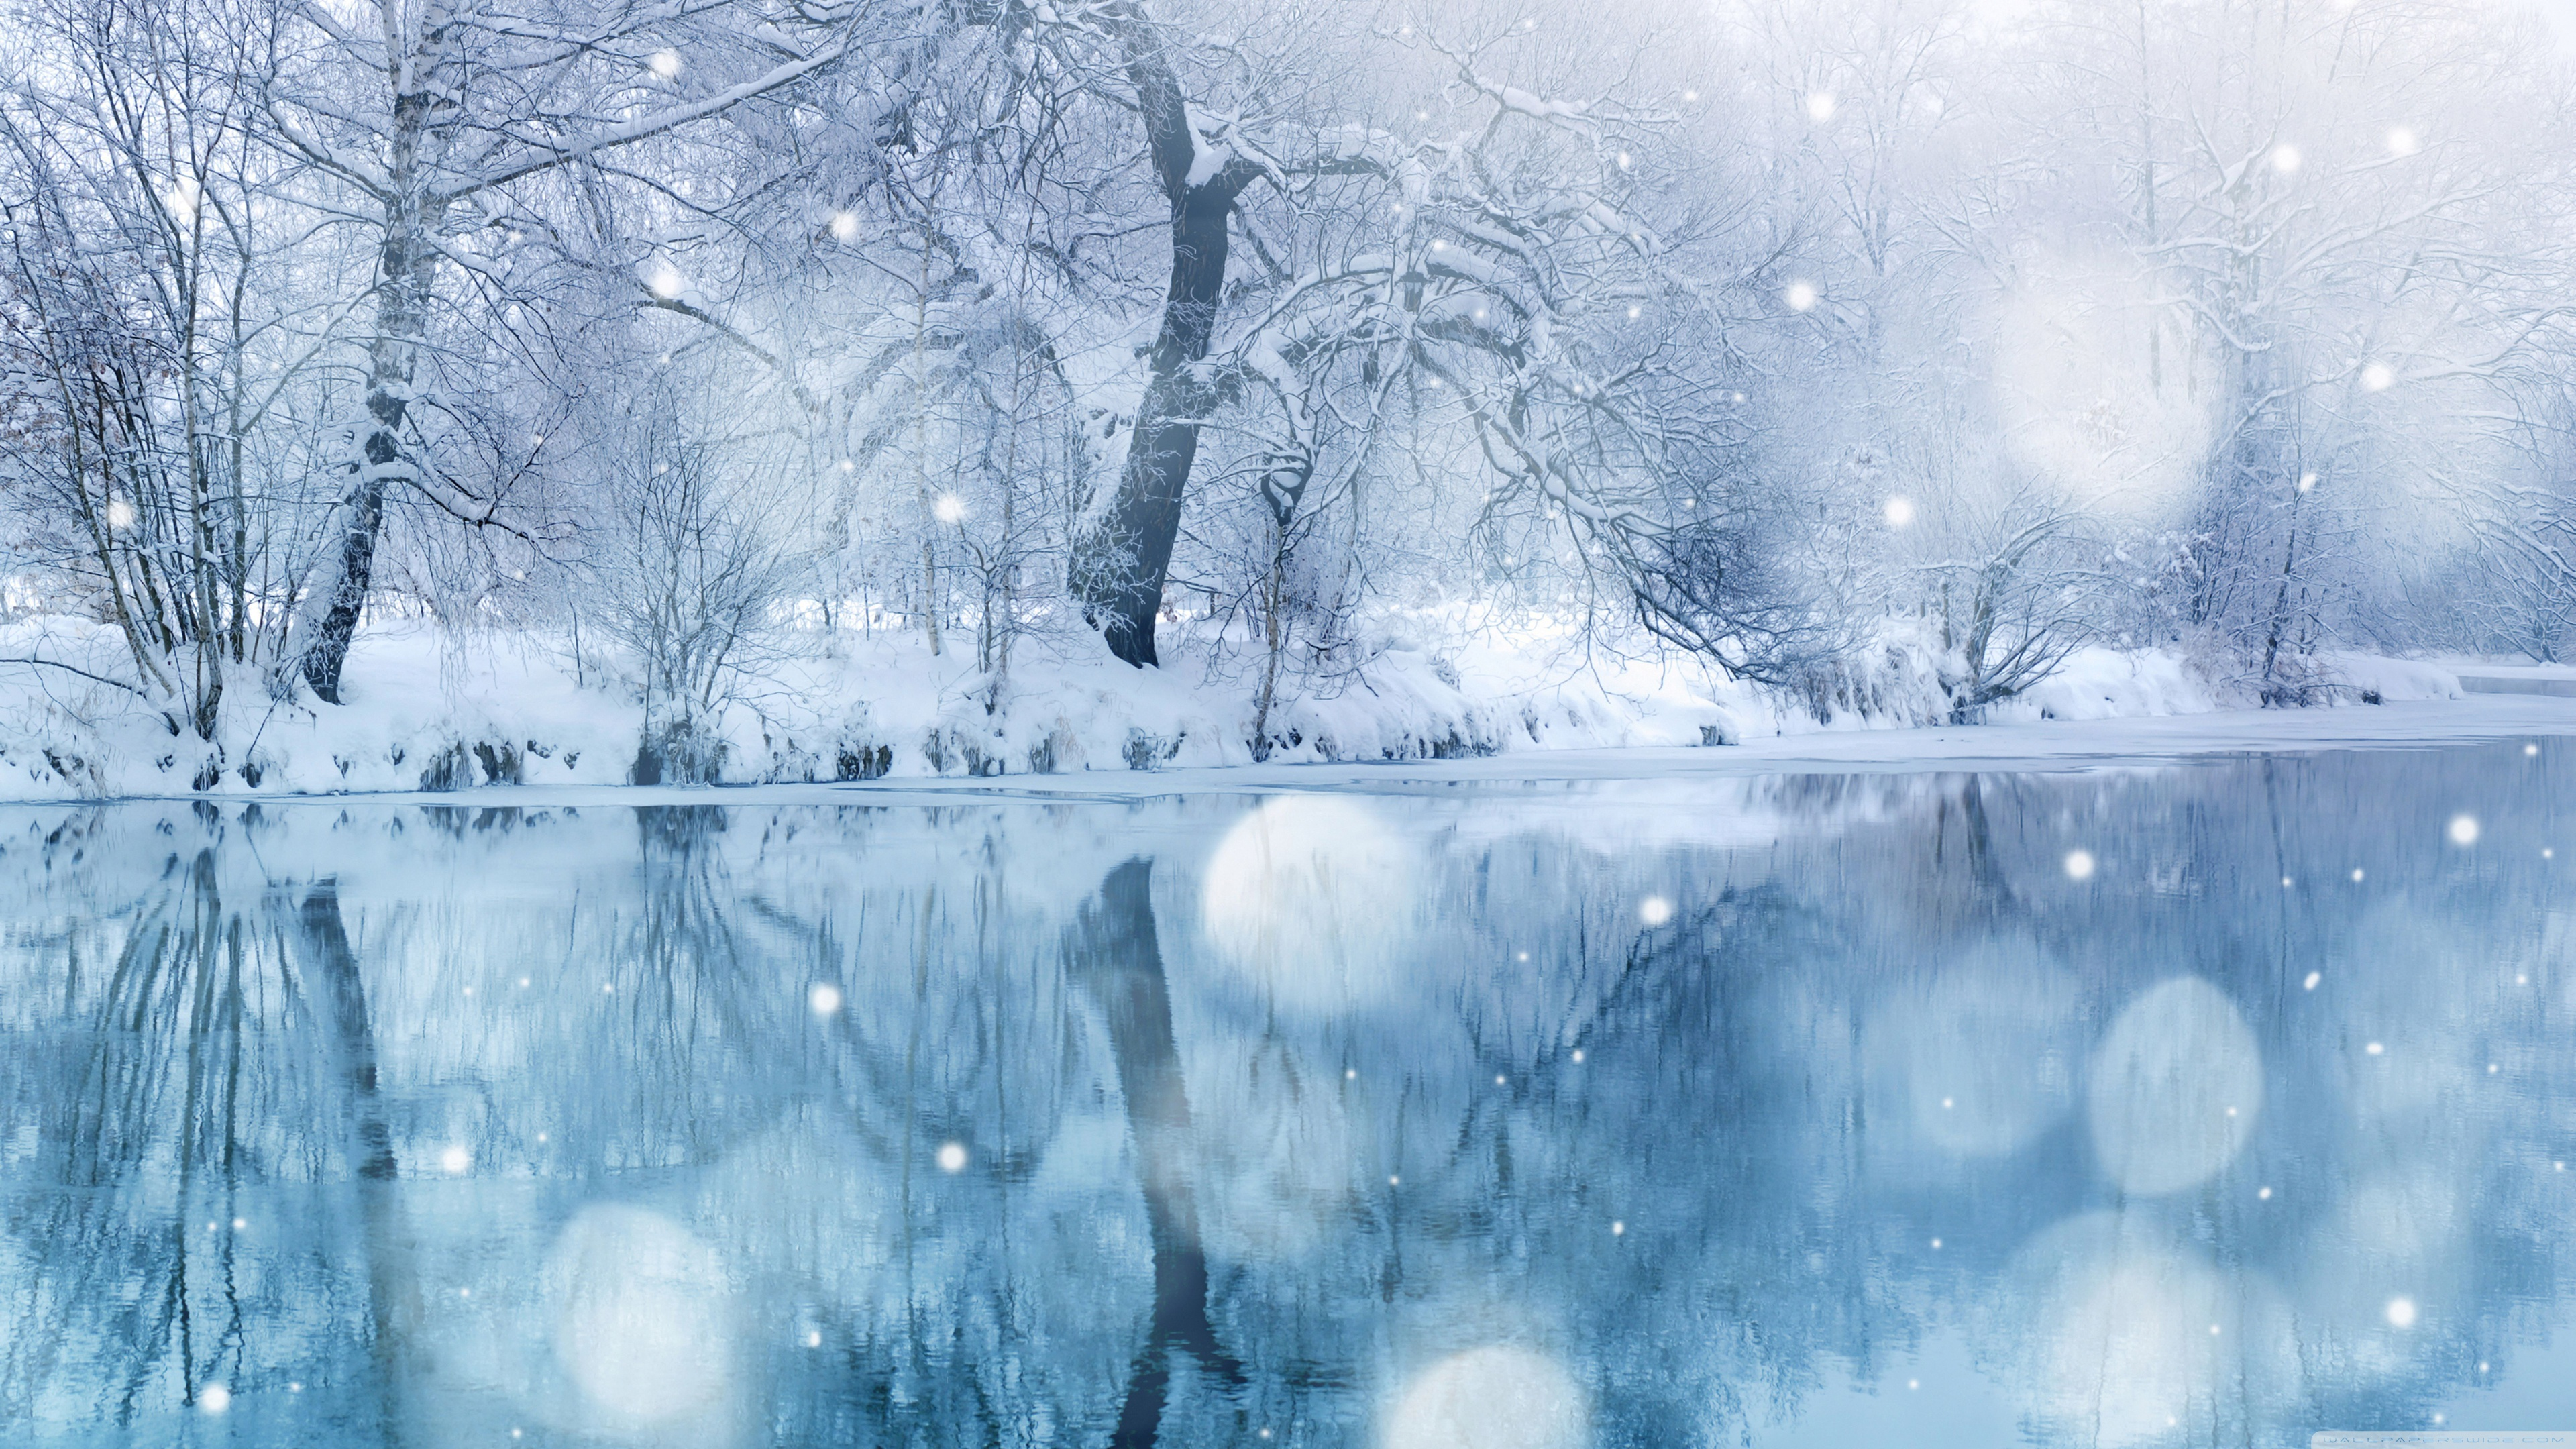 Snowfall Wallpaper